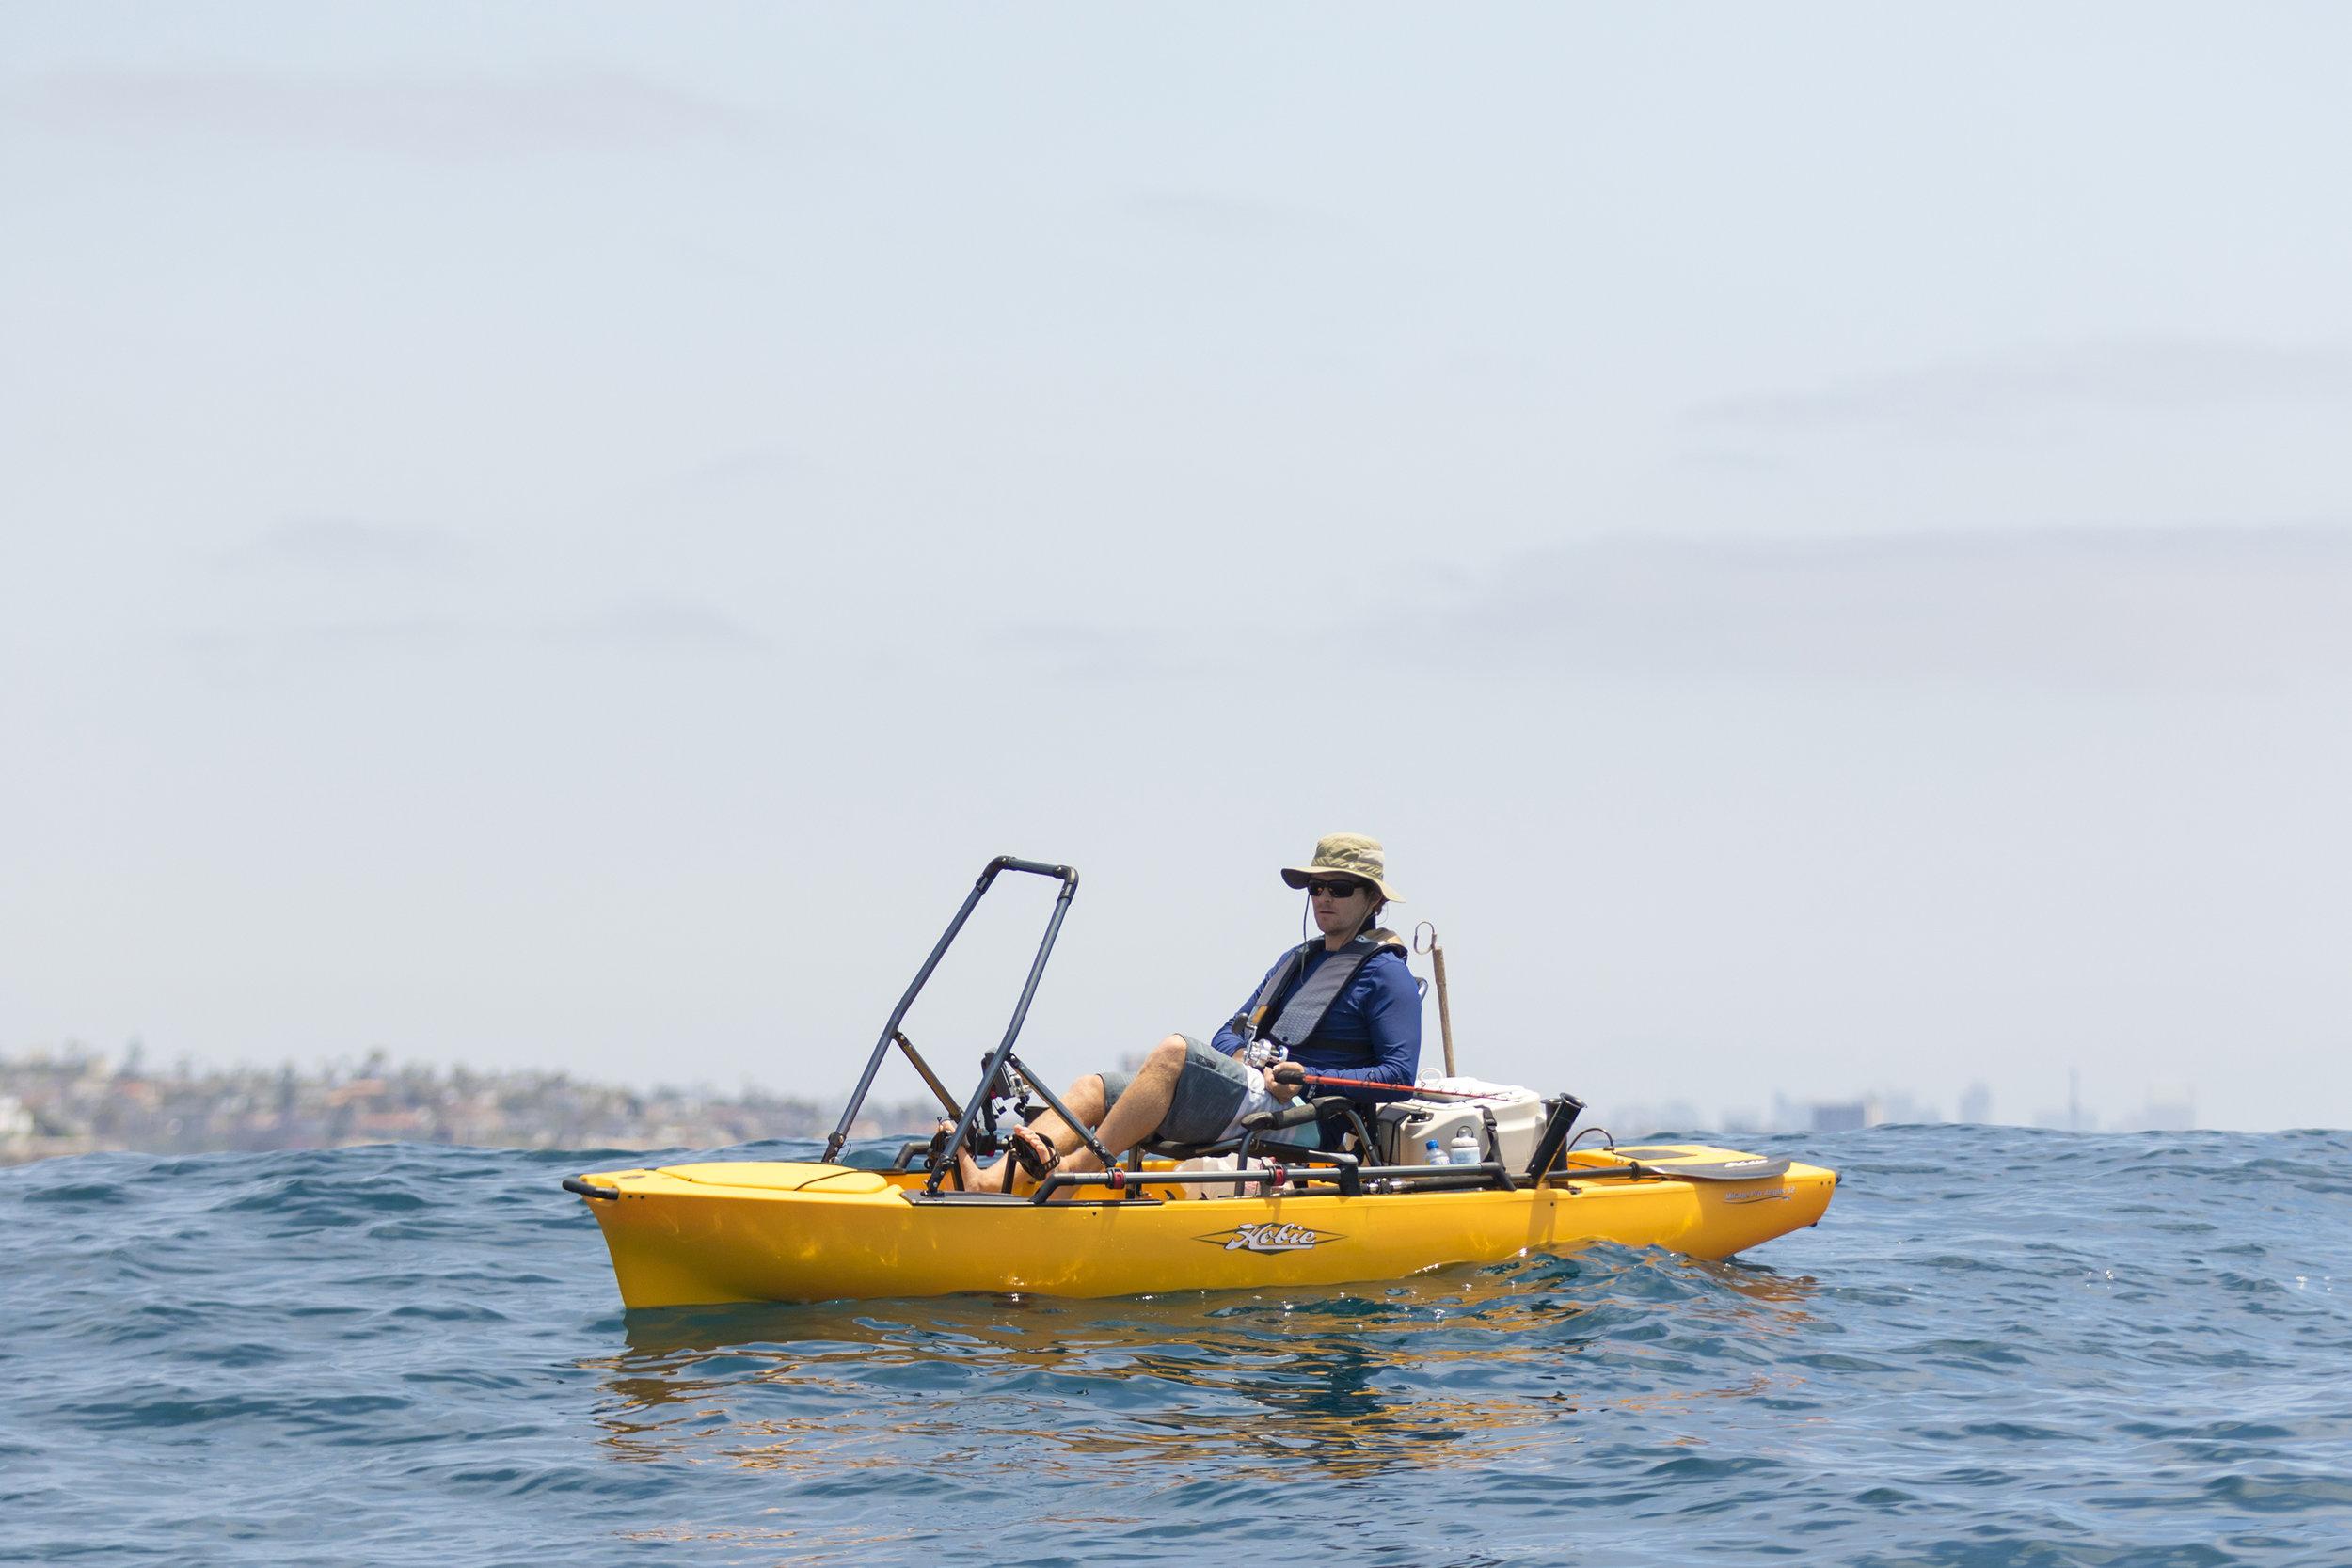 ProAngler12-action-fishing-hBar-Brendan-ocean-sitting-lg.jpg